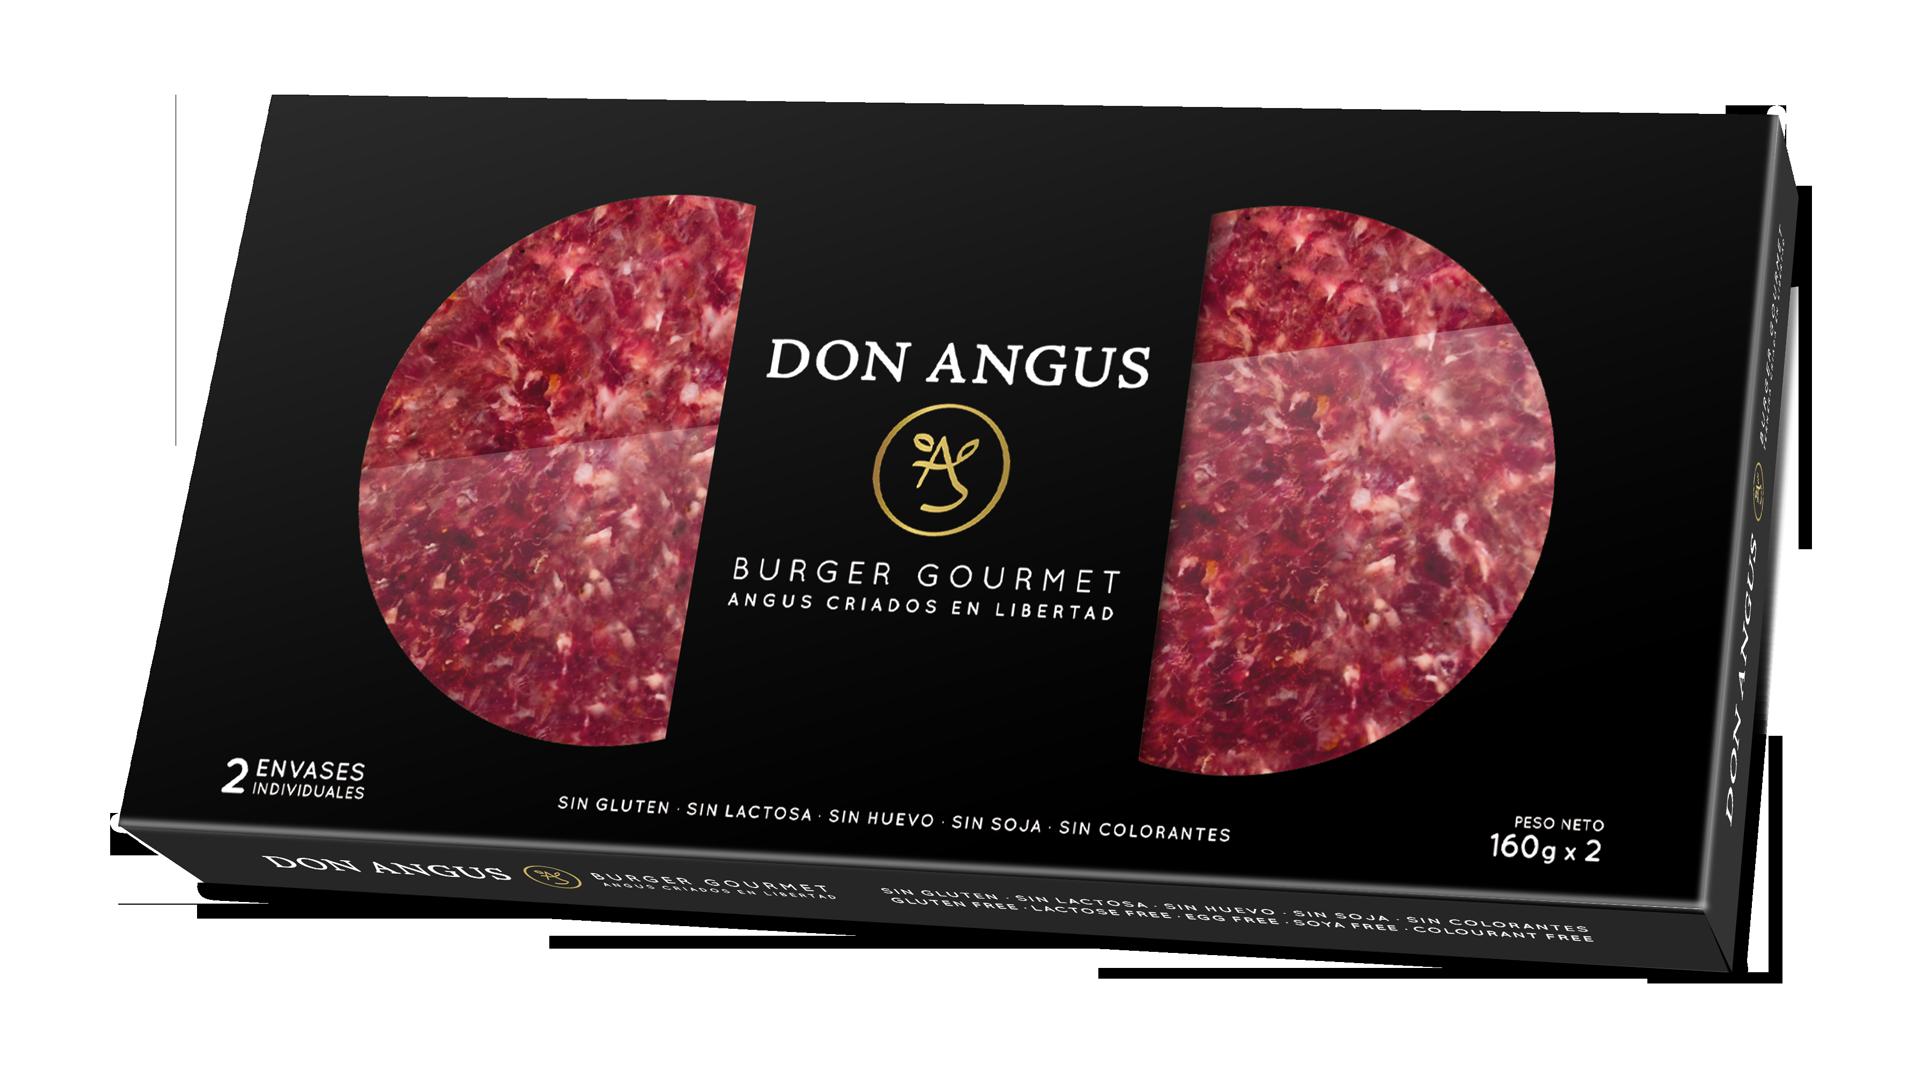 Hamburguesas Don Angus packaging